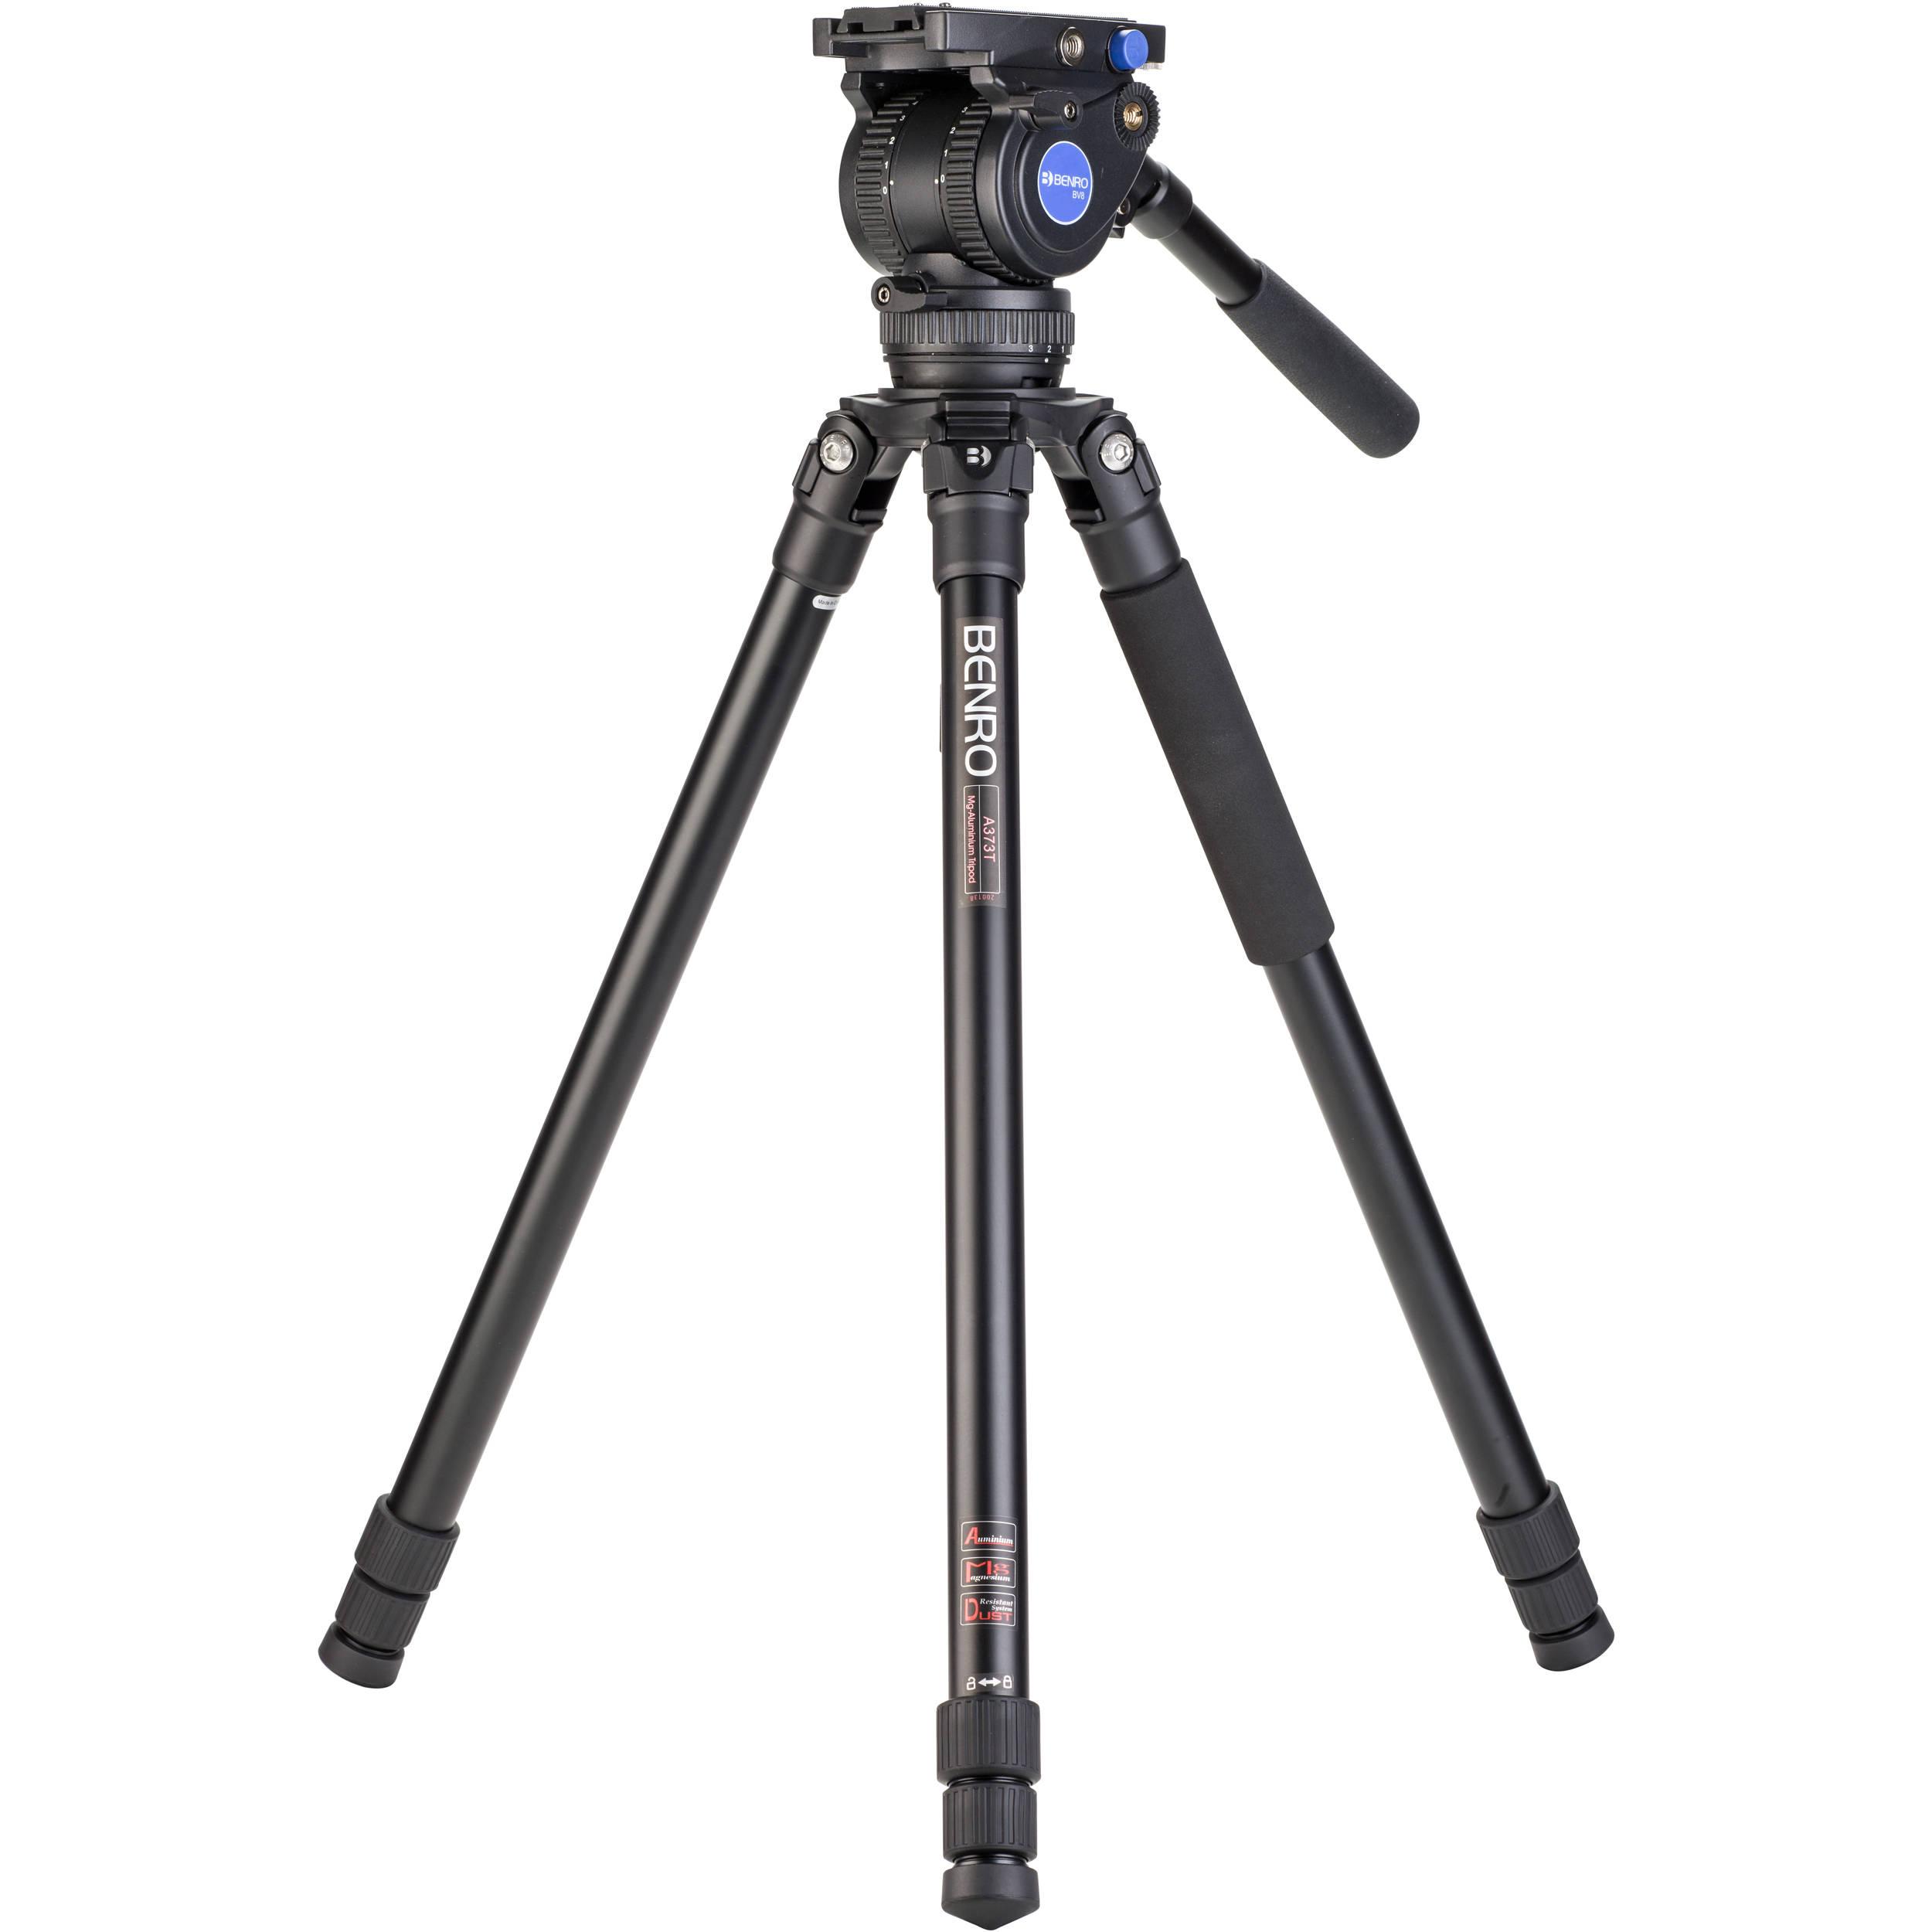 Https C Product 1324679 Reg Jam Tangan 8gb Spy Cam Watch Camera Sport Benro A373tbv8h Single Tube 75mm 1335992